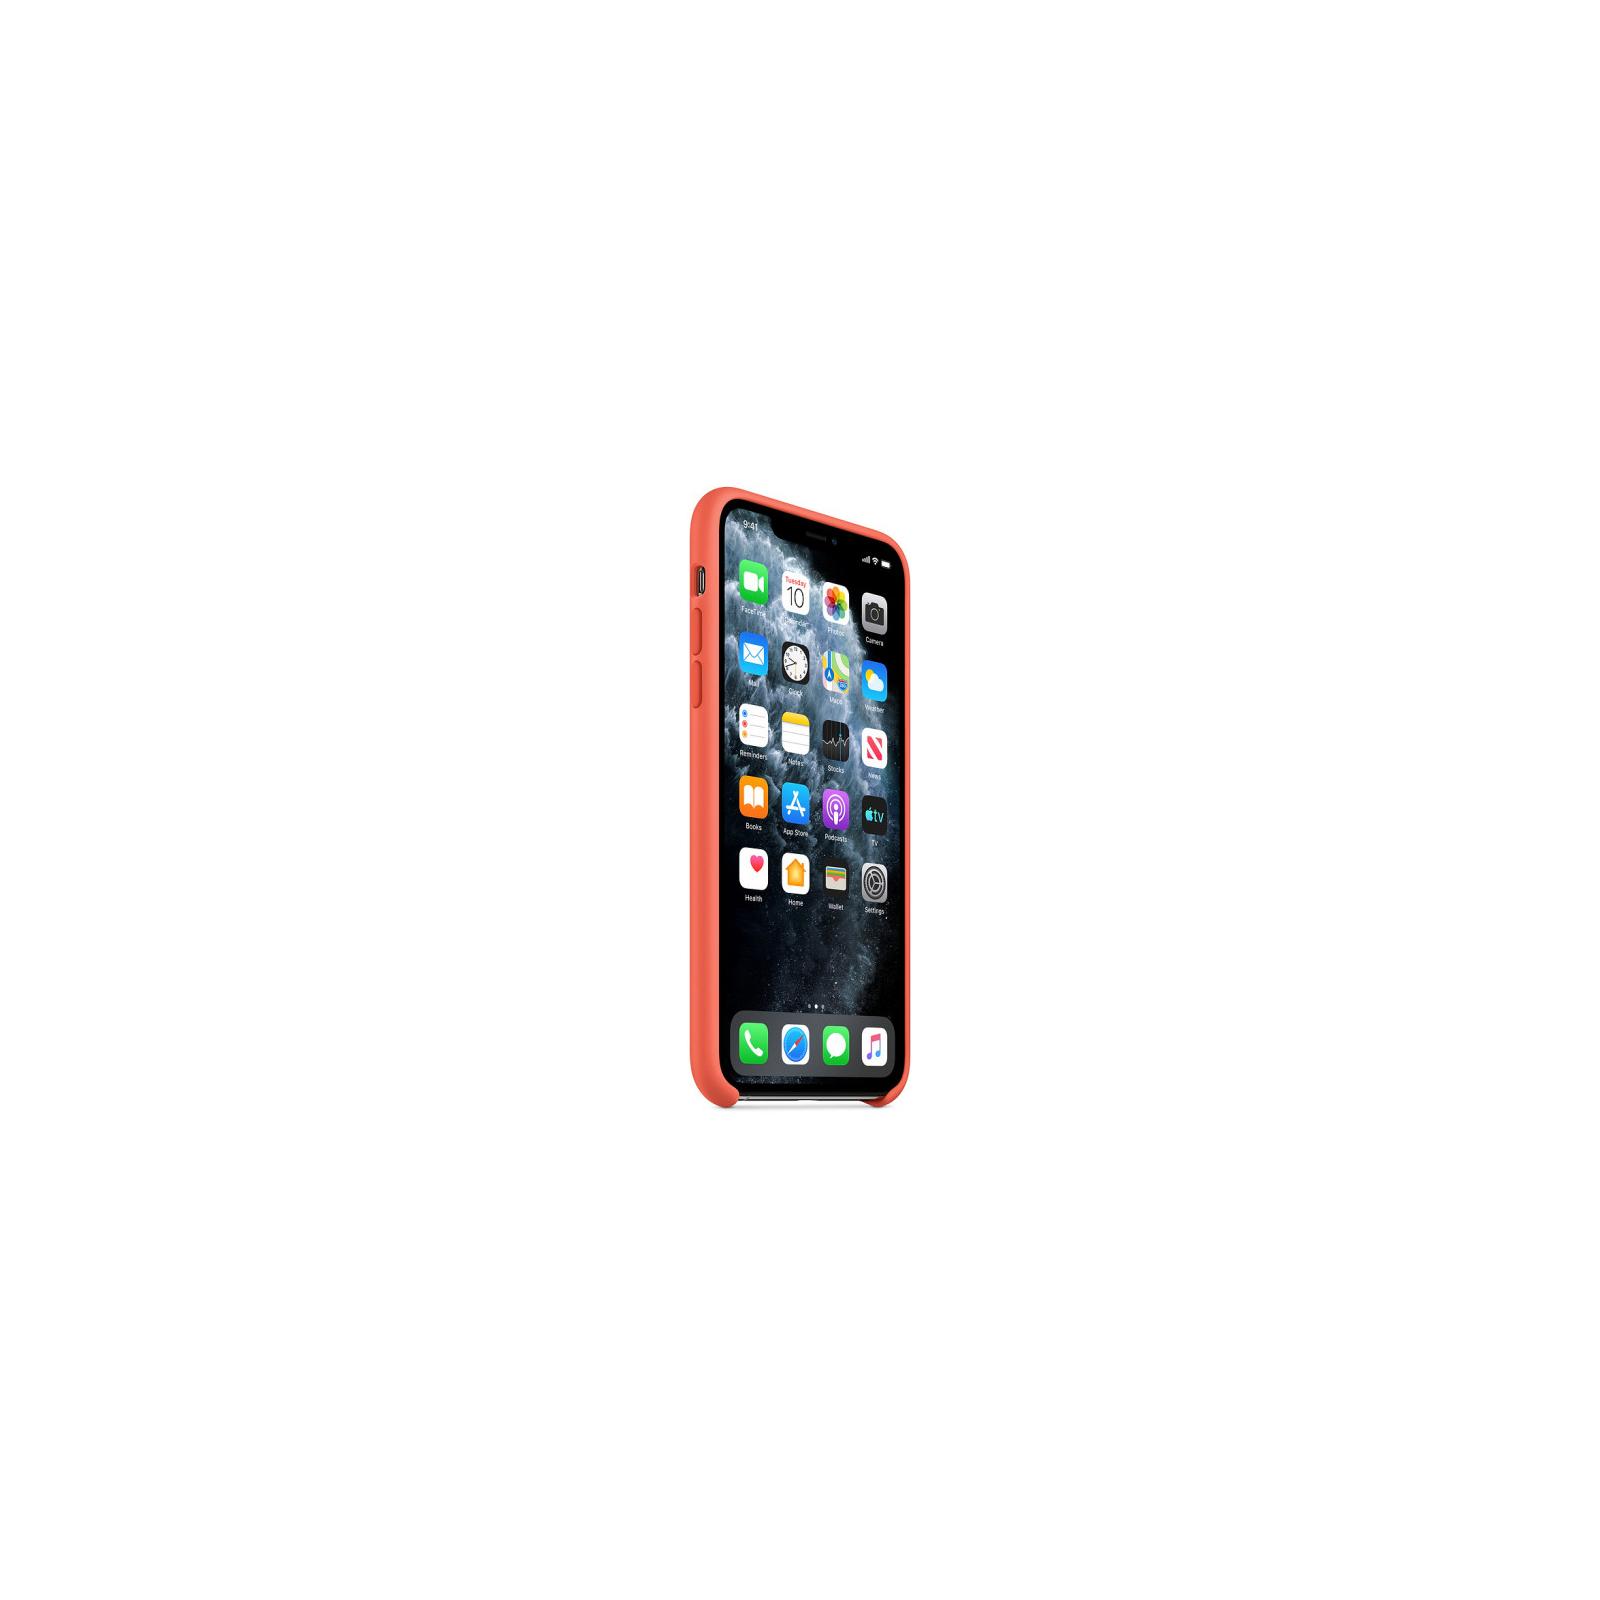 Чехол для моб. телефона Apple iPhone 11 Pro Max Silicone Case - Clementine (Orange) (MX022ZM/A) изображение 5